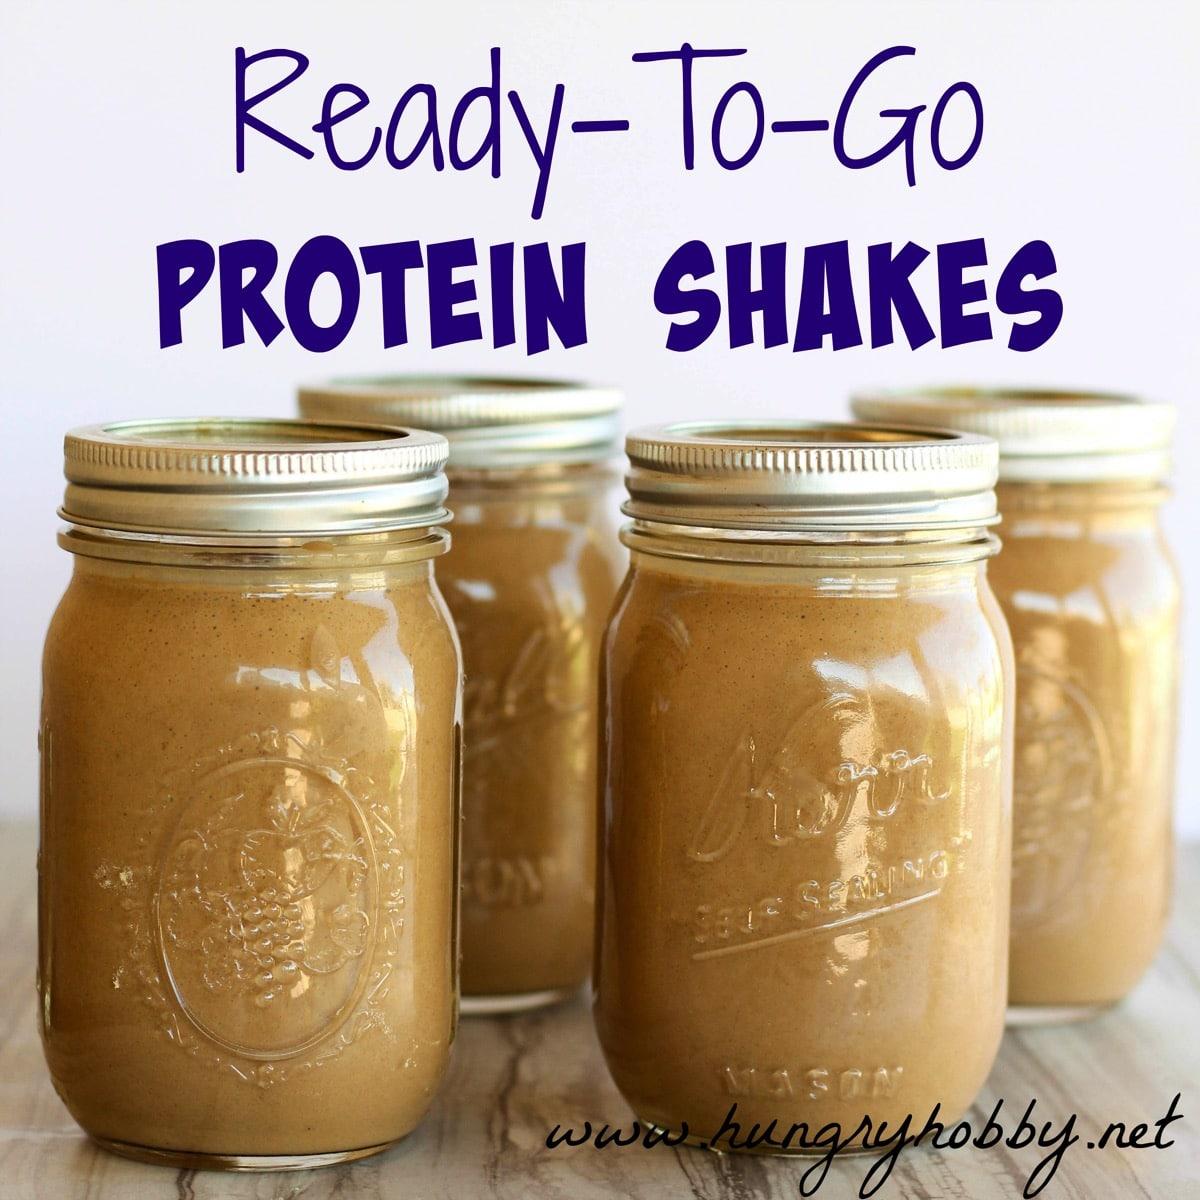 ready-to-go-protein-shakes.jpg